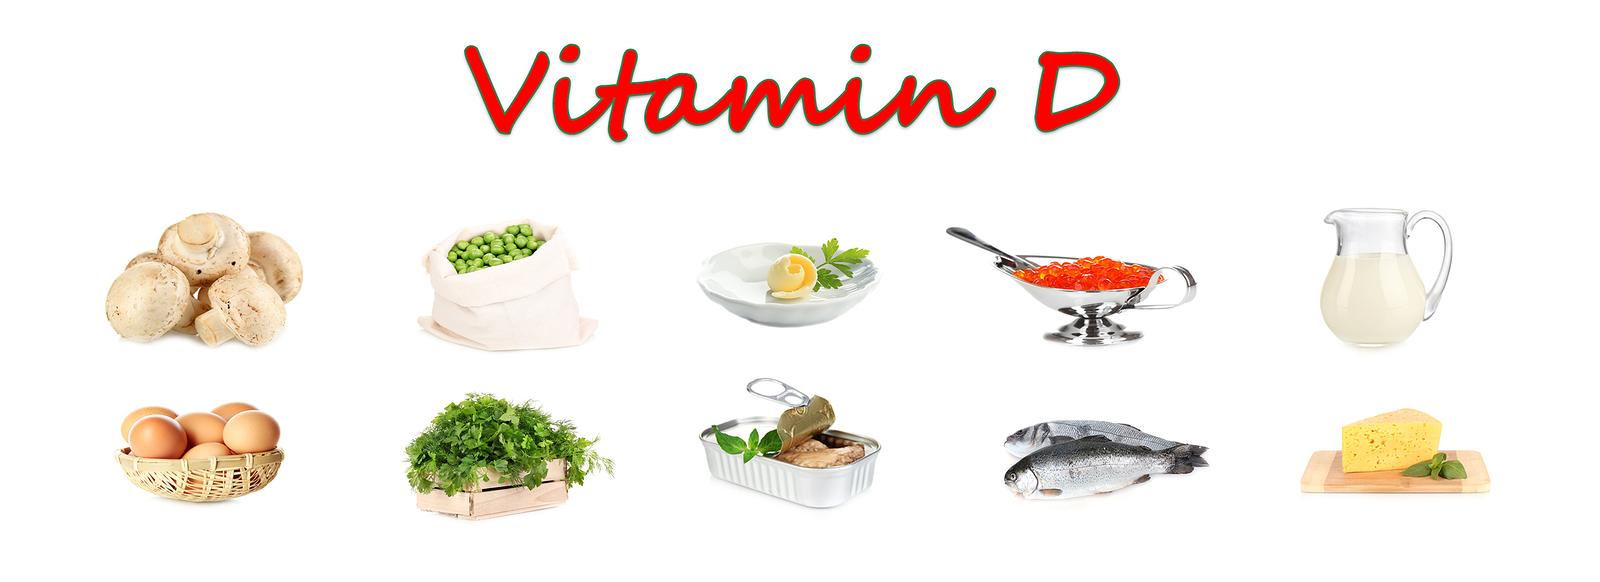 ce fructe contin vitamina d